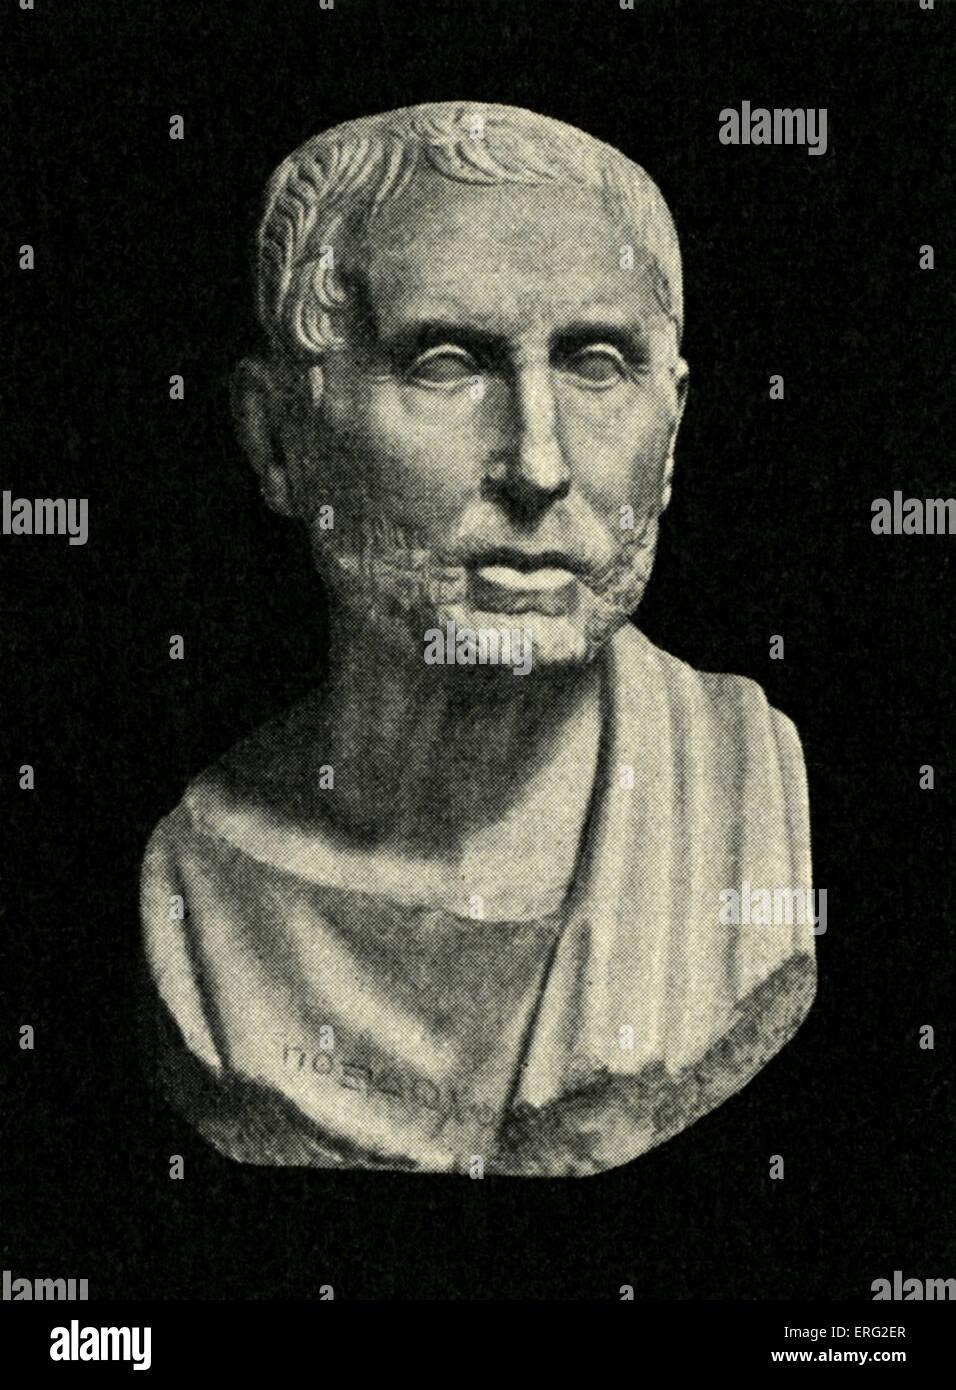 Bust of Posidonius of Rhodes, Greek Stoic philosopher and polymath 135 BCE - 51 BCE. - Stock Image